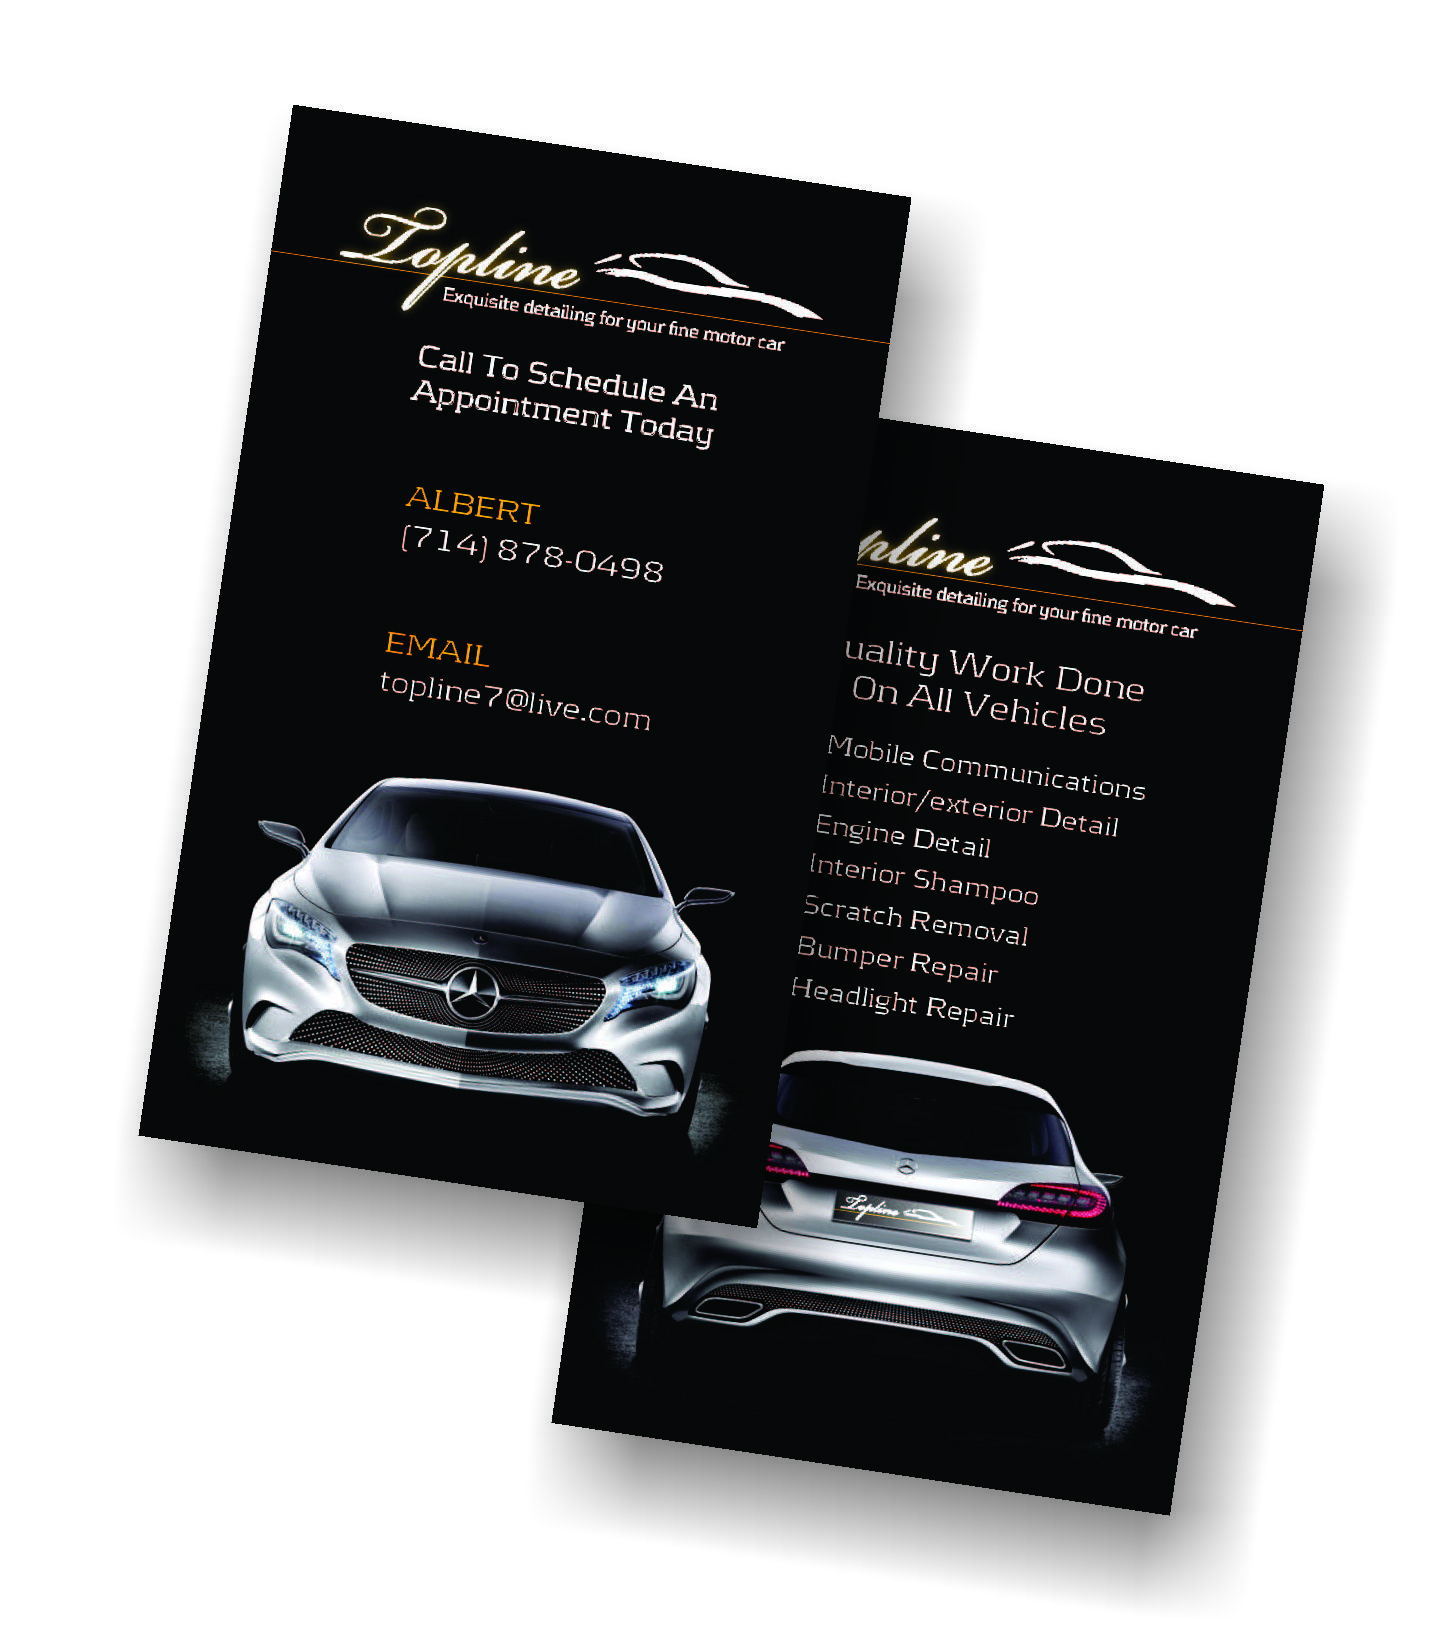 Business Card Design For Auto Detail Shop Business Cards Creative Free Business Cards Business Card Design Creative